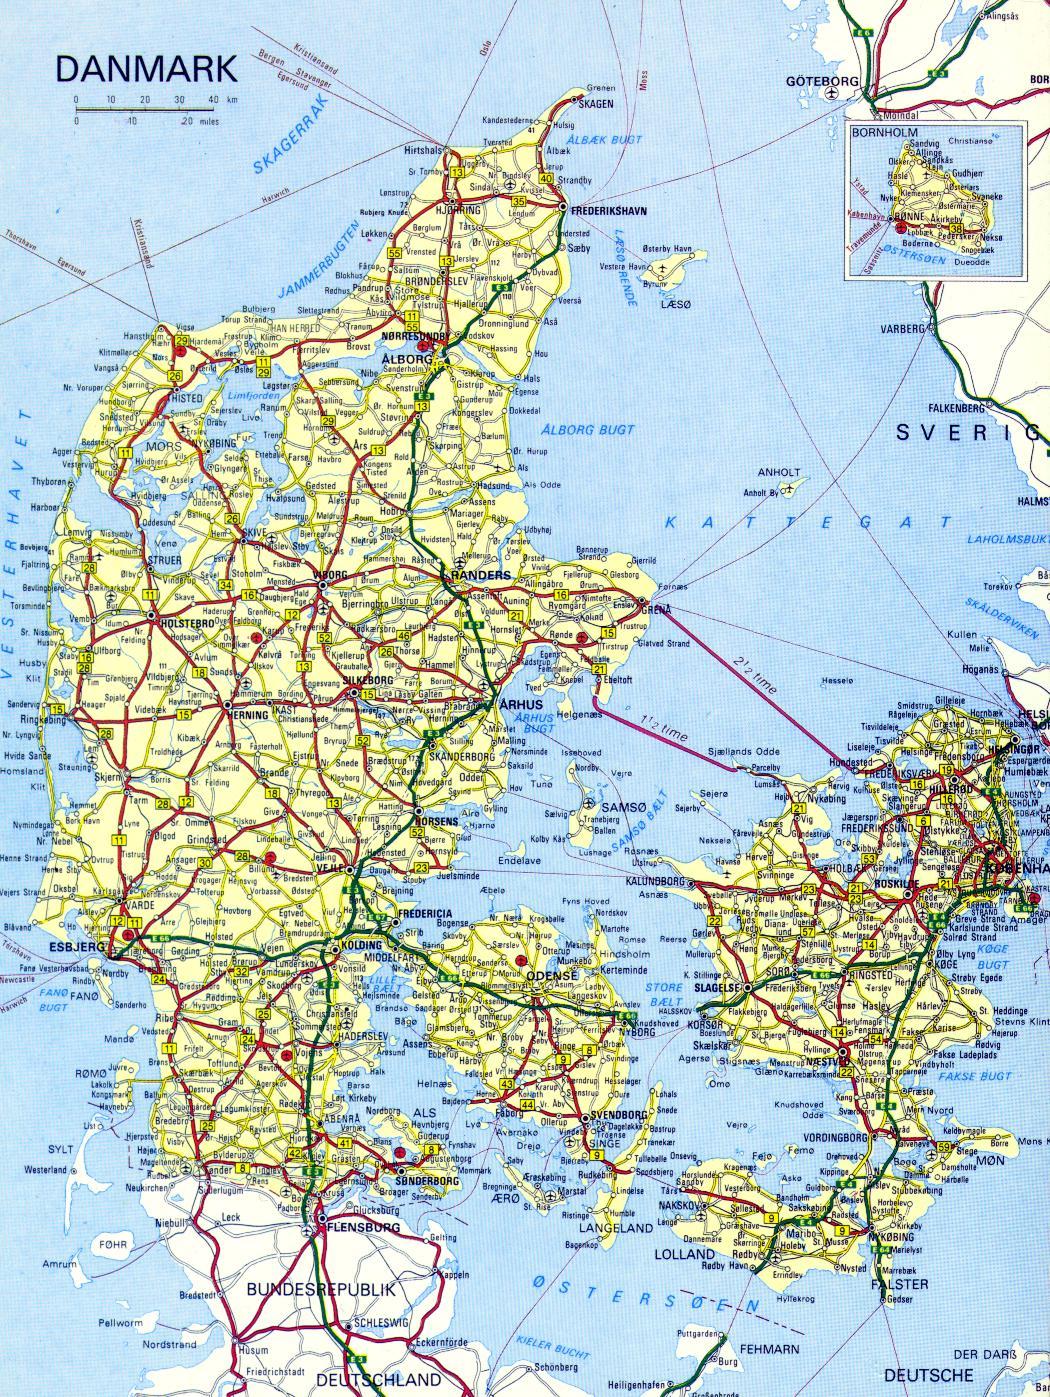 Denmark Online Maps Geographical Political Road Railway - Denmark map